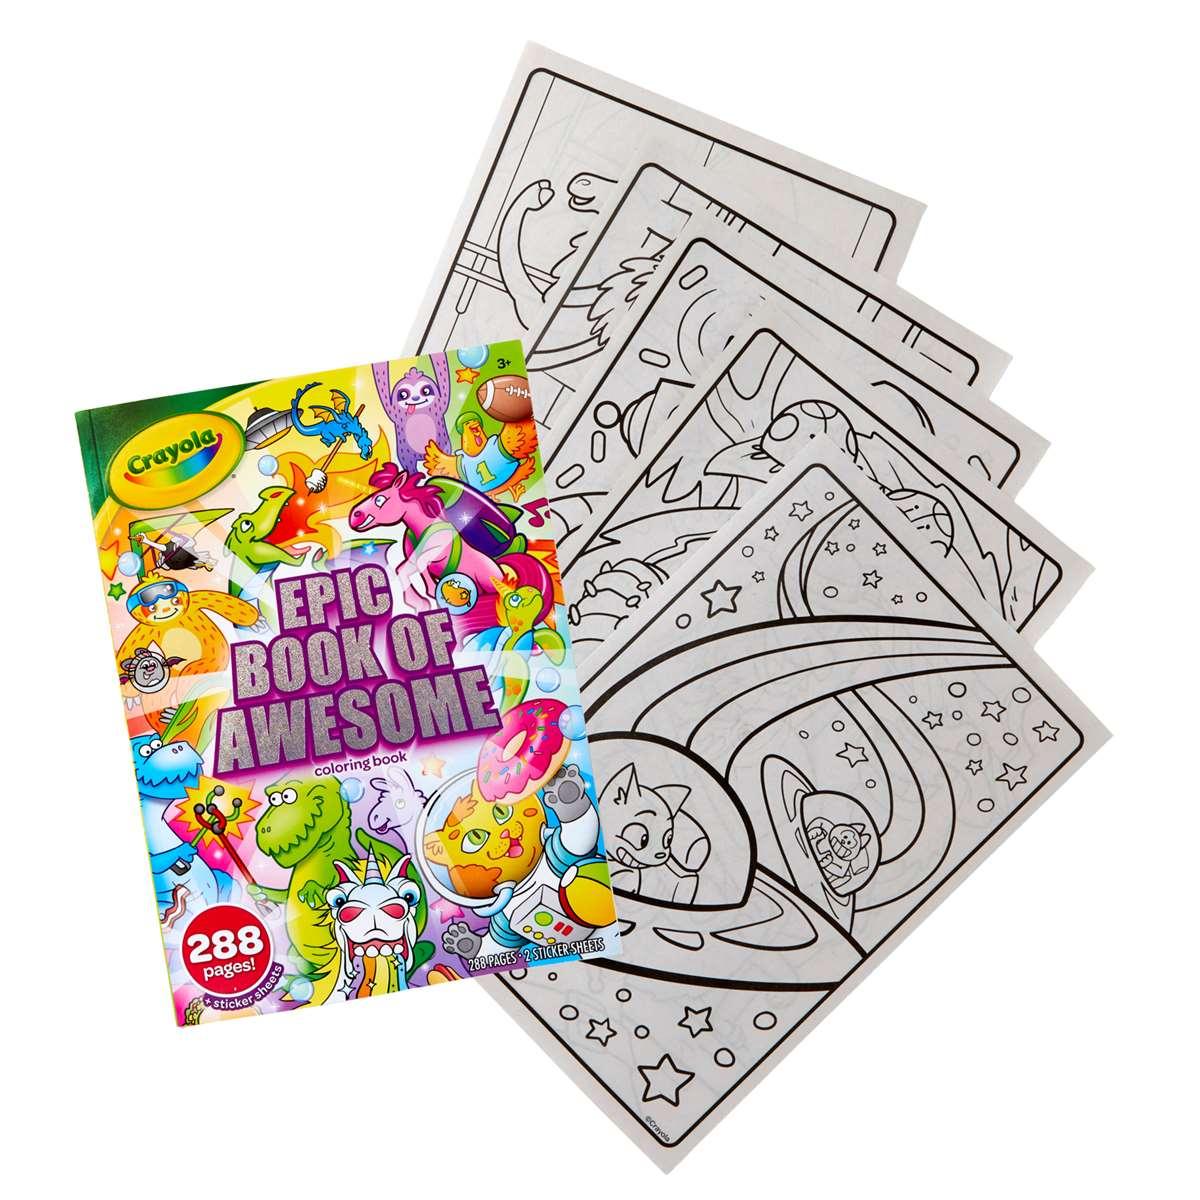 288pg Coloring Book Epic Adventure Bin40585 Crayola Art Activity Books K12 School Supplies Teacher Supplies